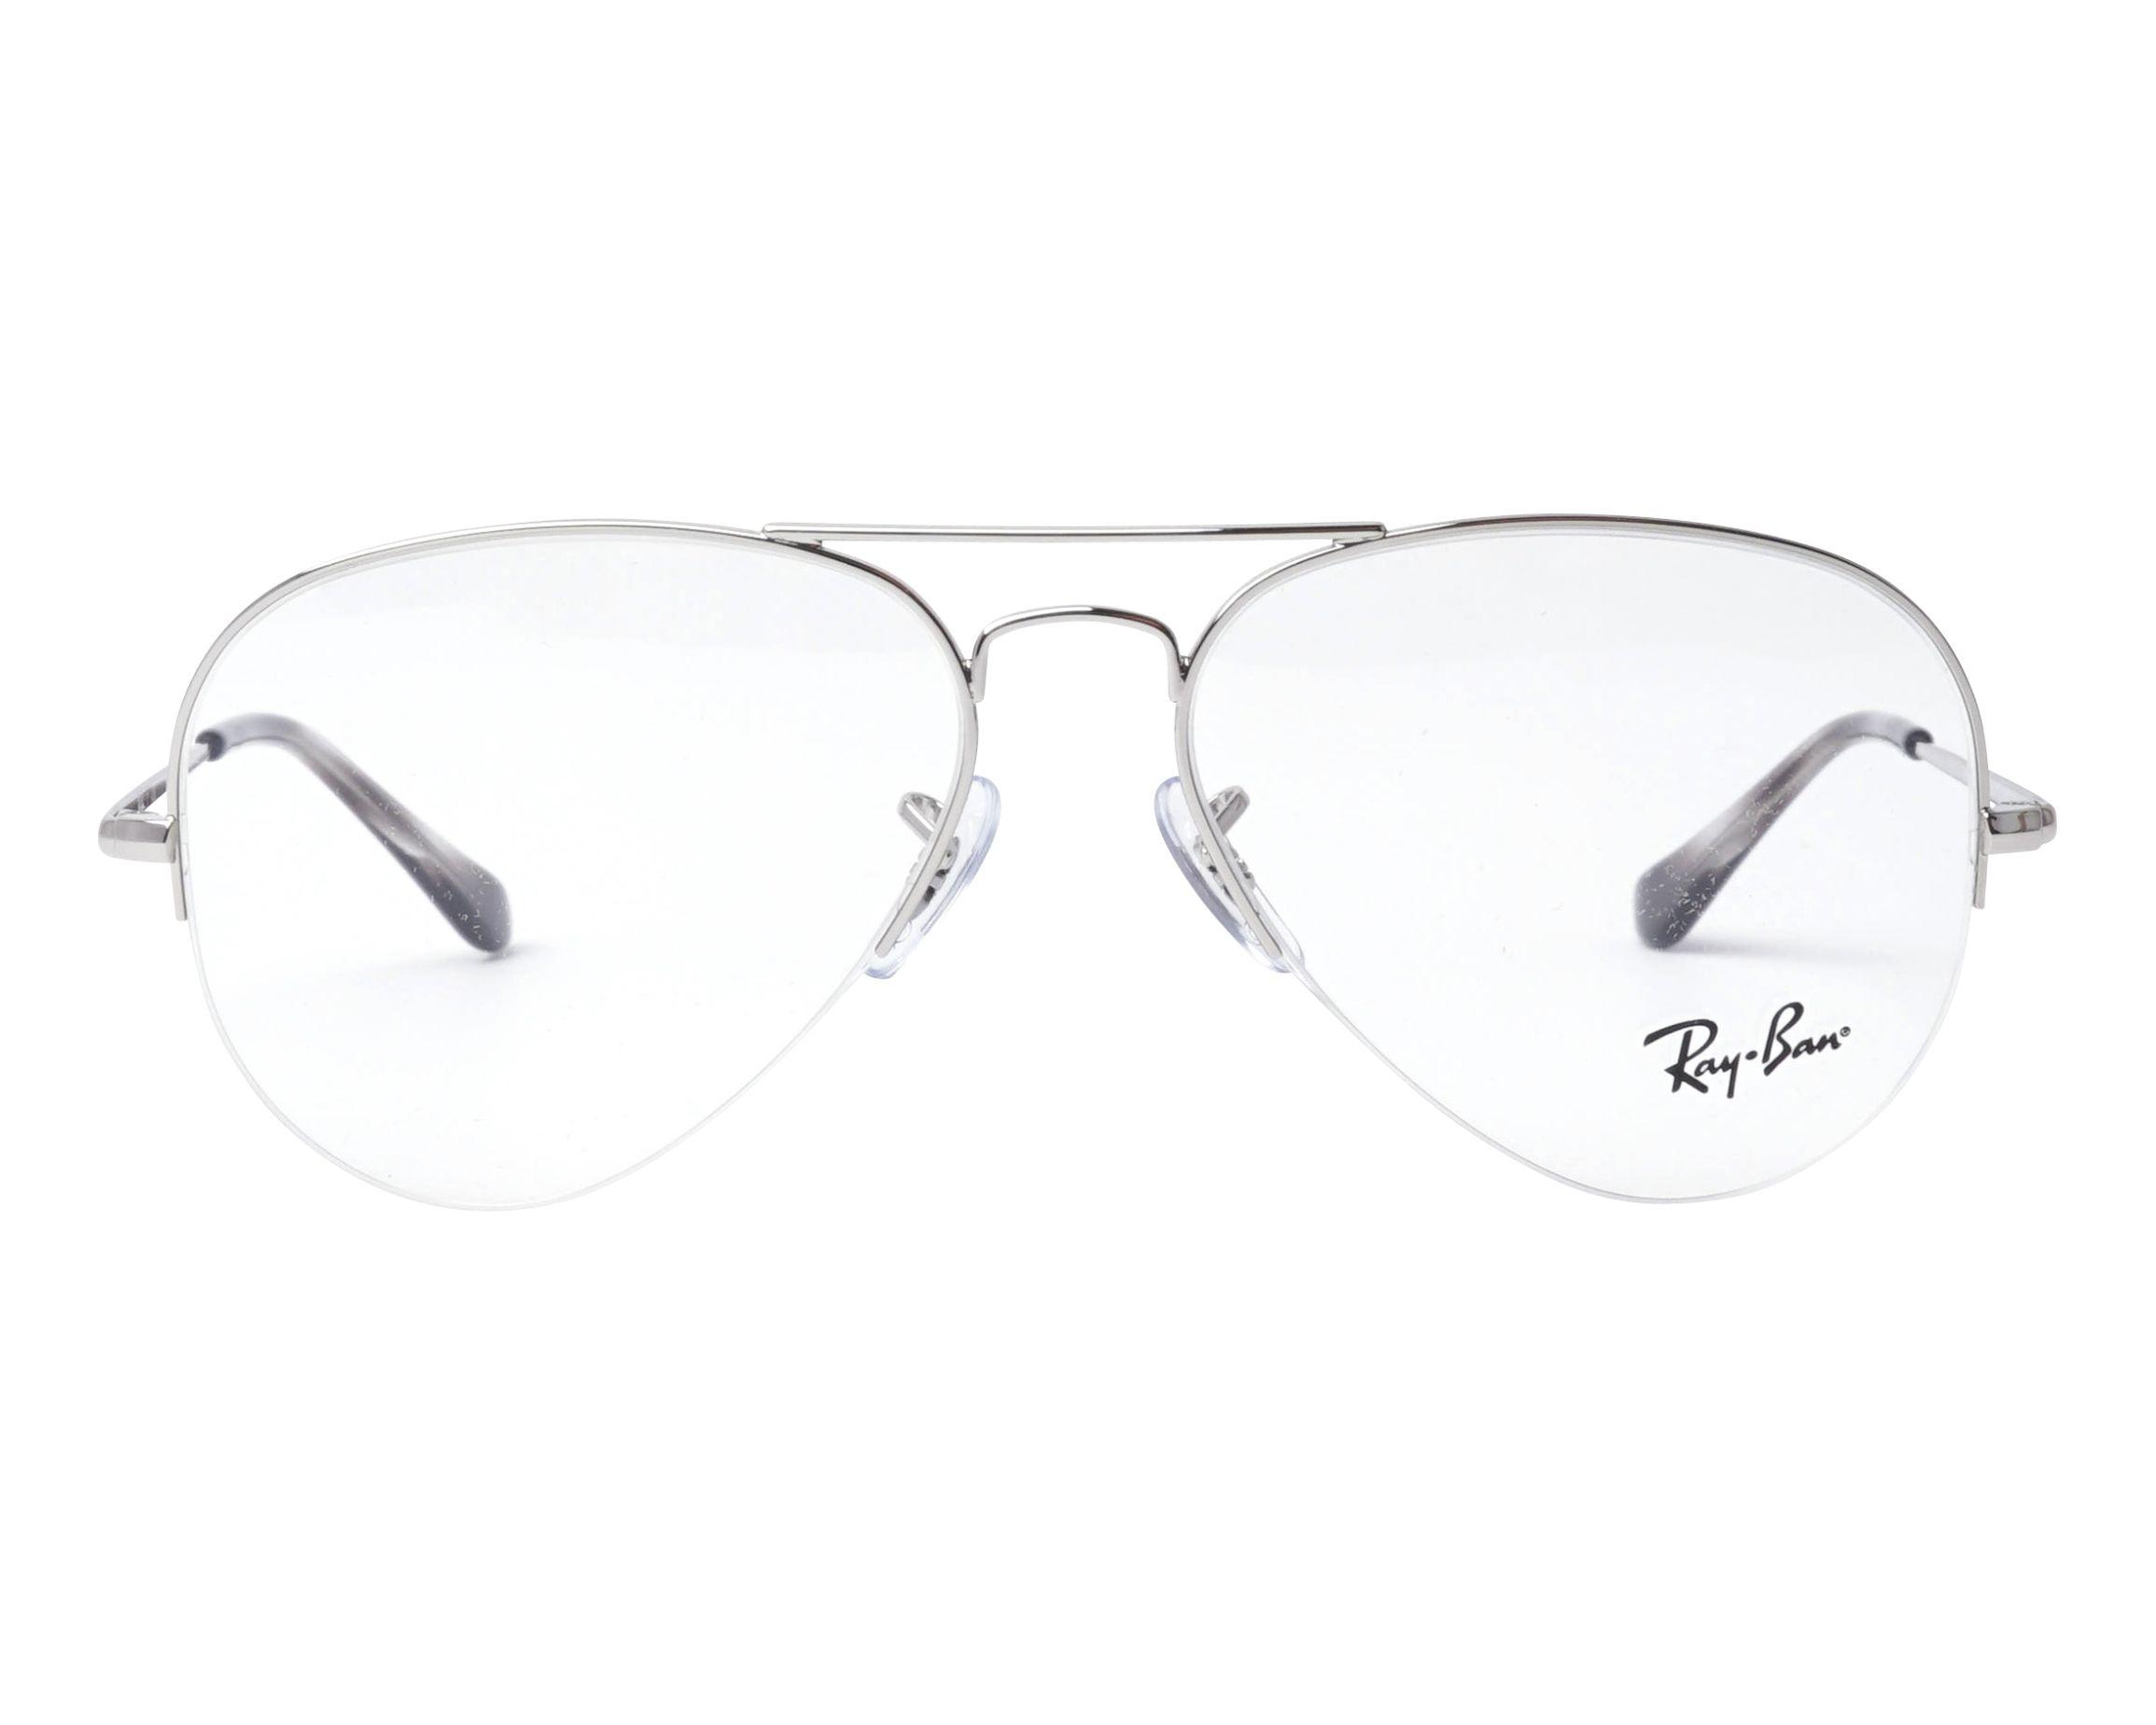 54c2cd6e0e0 eyeglasses Ray-Ban RX-6589 2501 - Silver front view